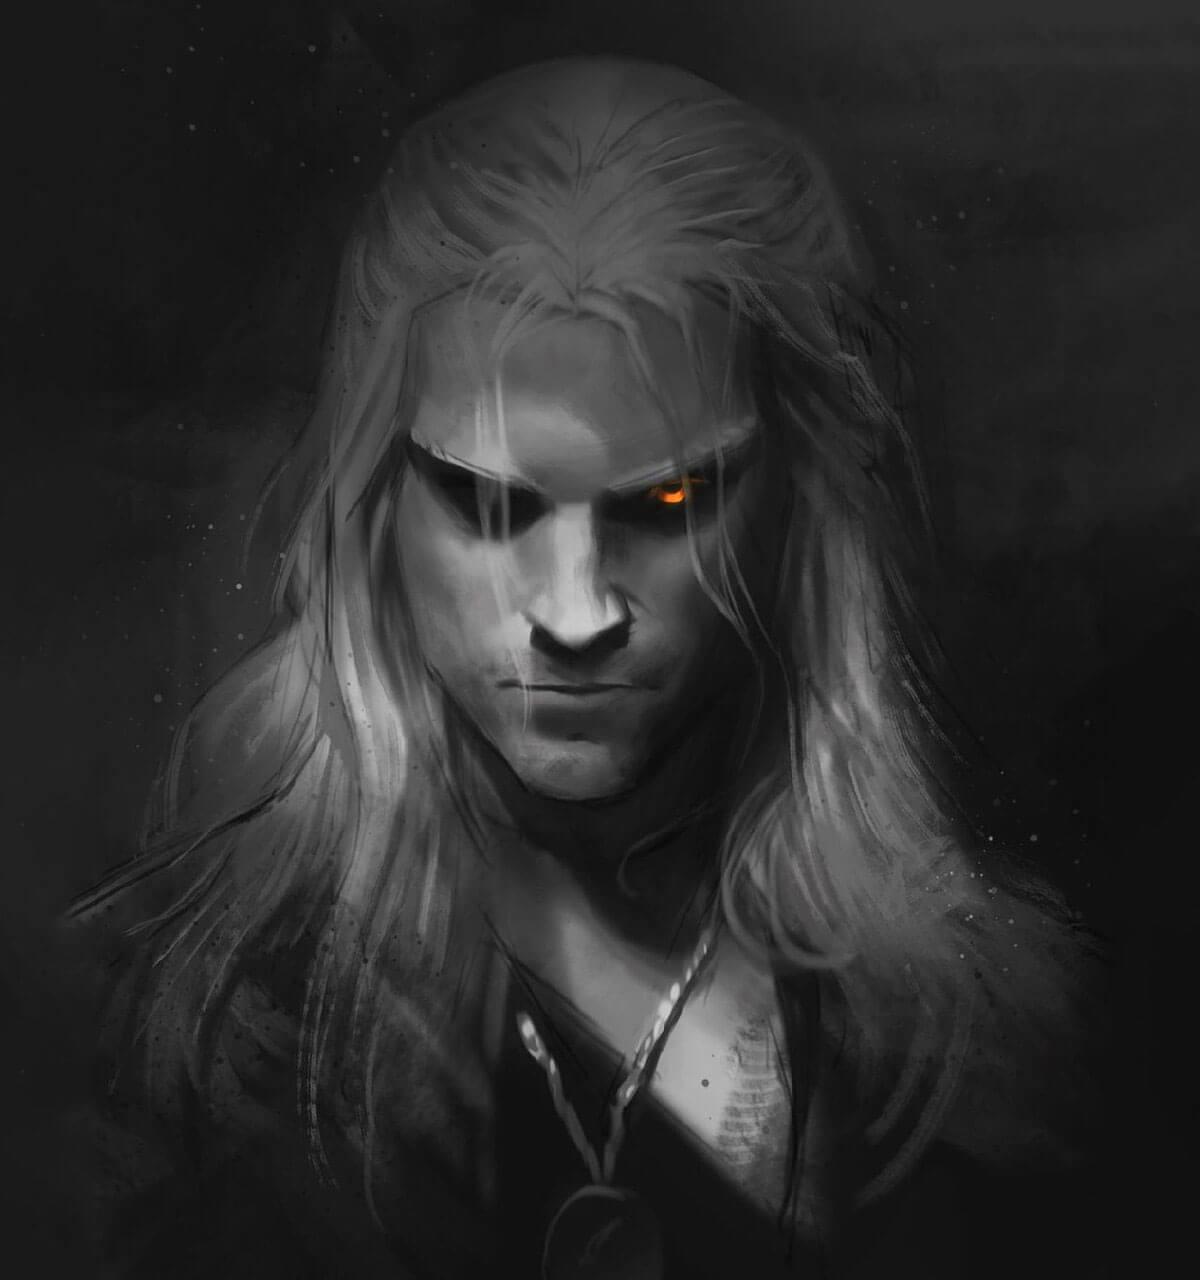 The Witcher Fanart by Anninosart